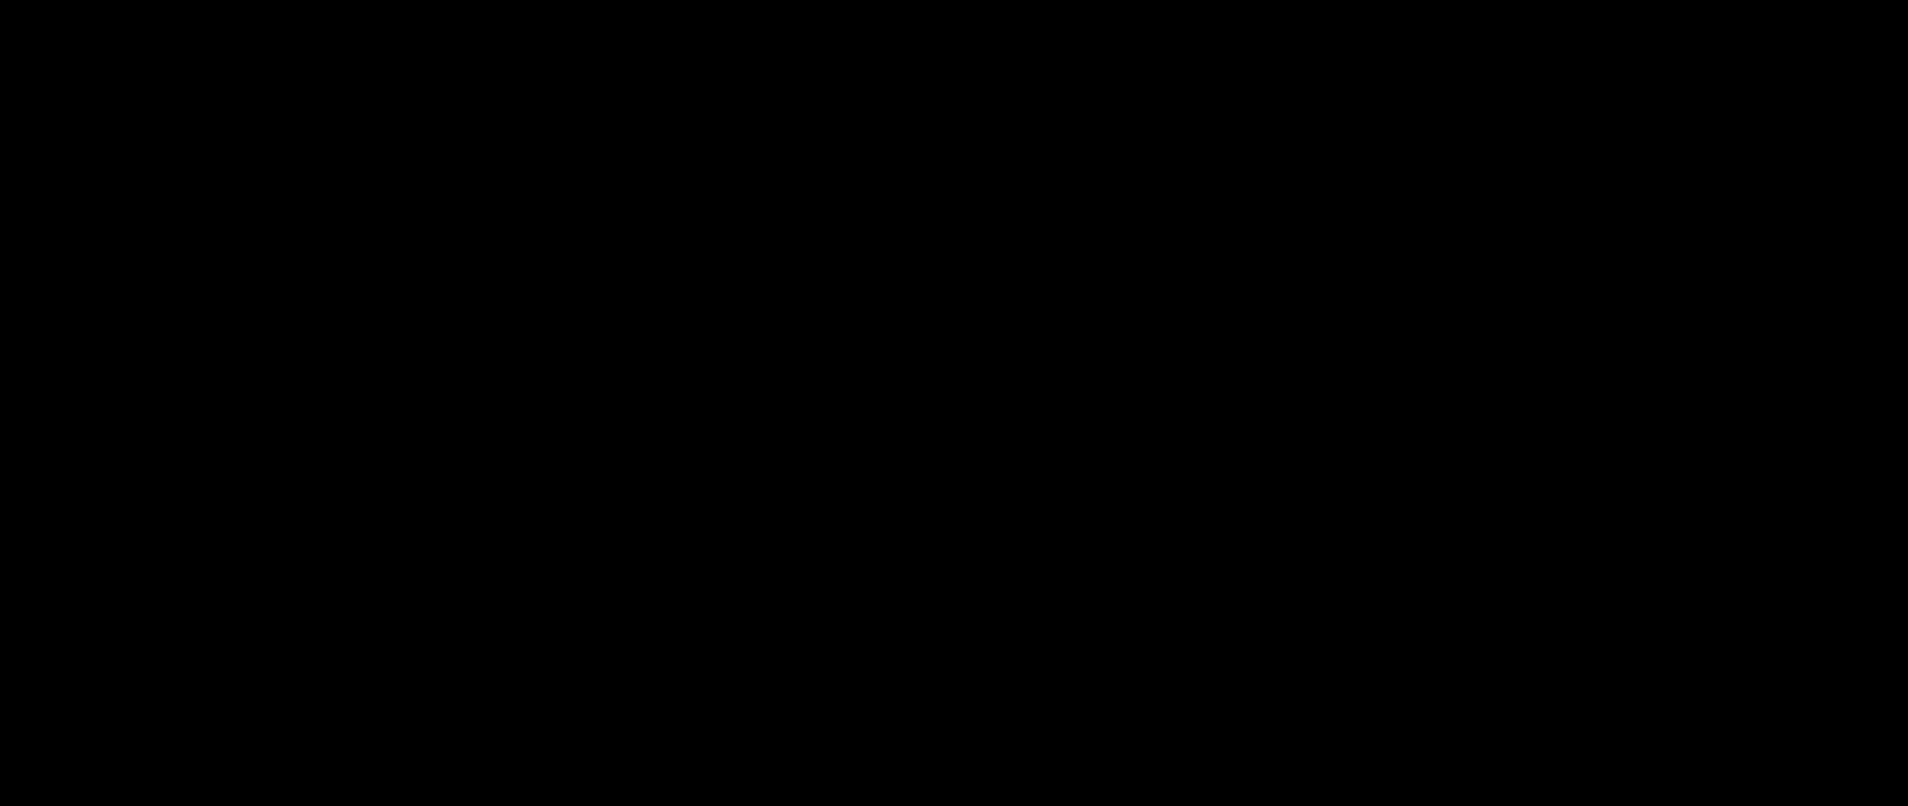 Deshydroxypropyl Silodosin